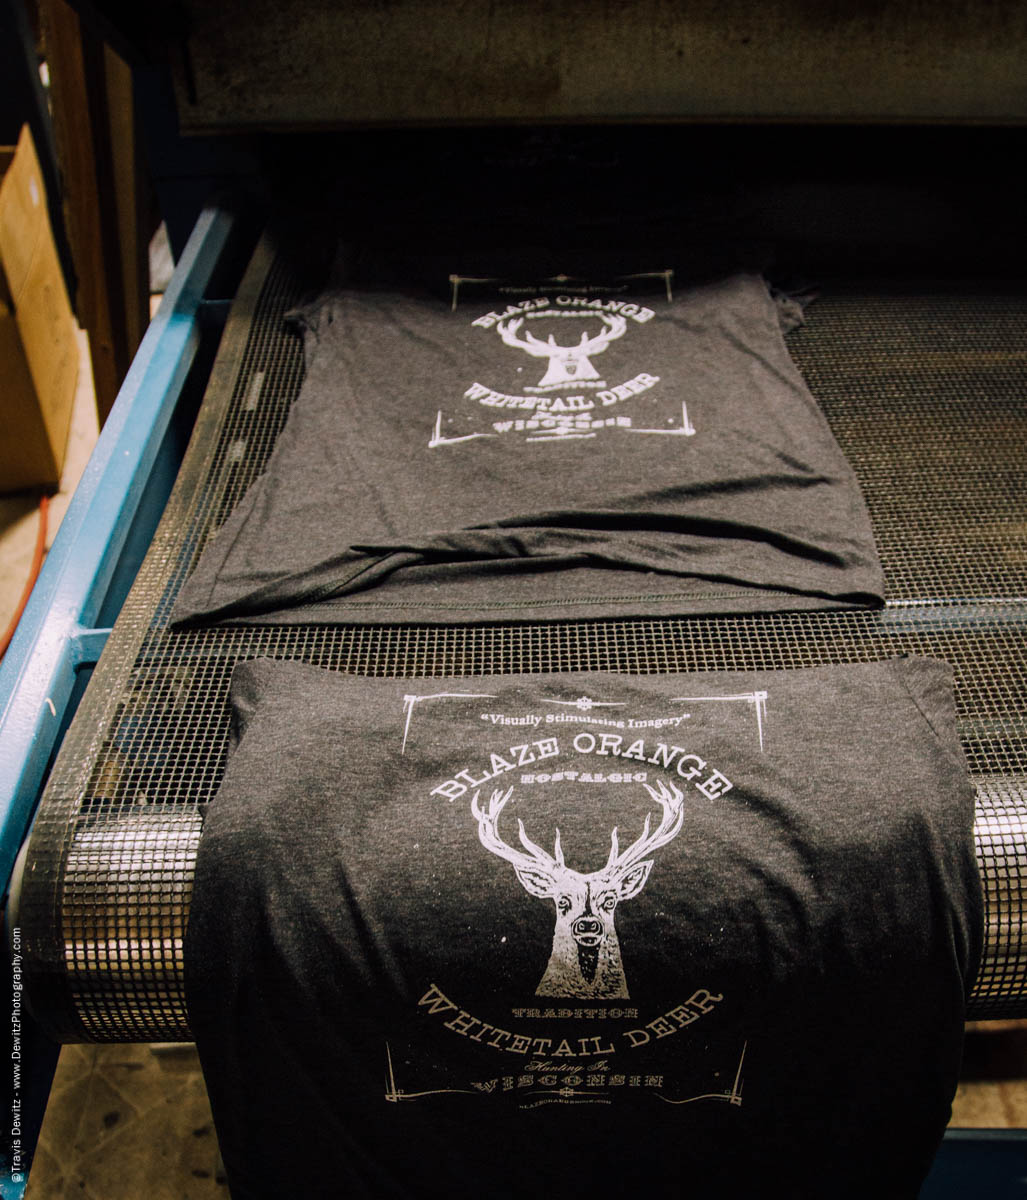 Blaze Orange Deer Huning Ambient Inks Shirt Production-3917